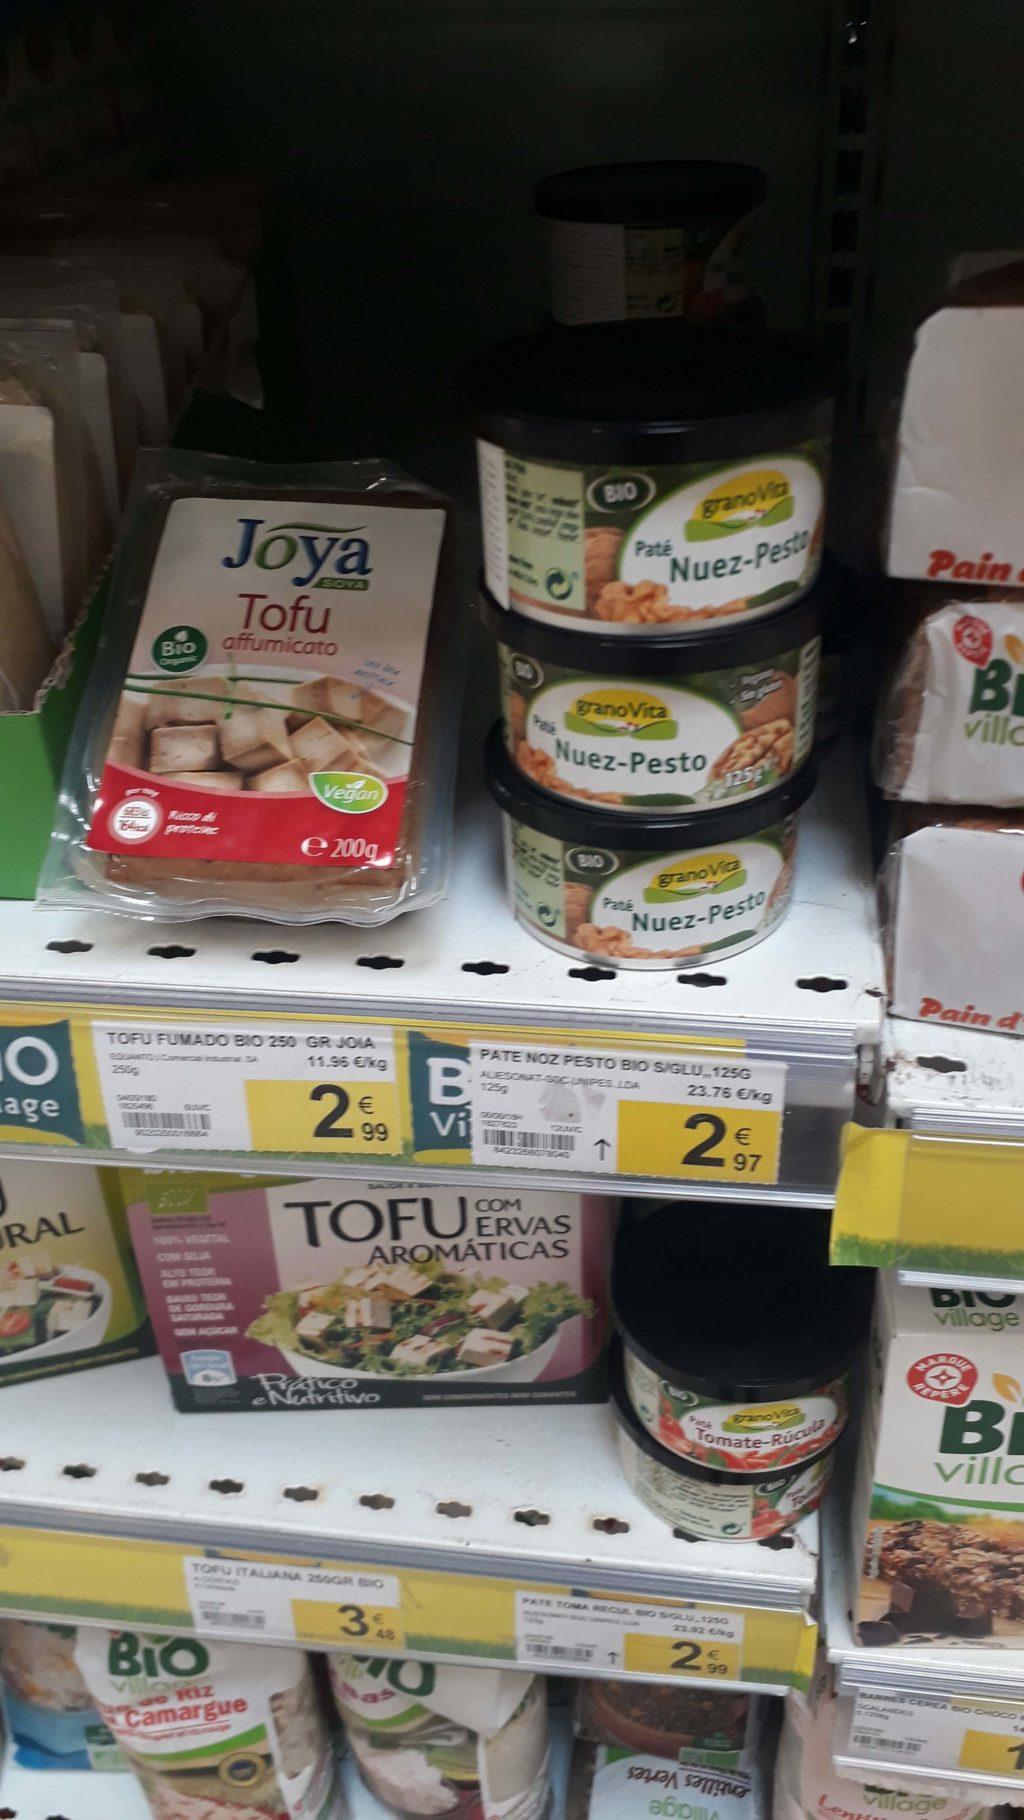 Tofu and nut pesto spread